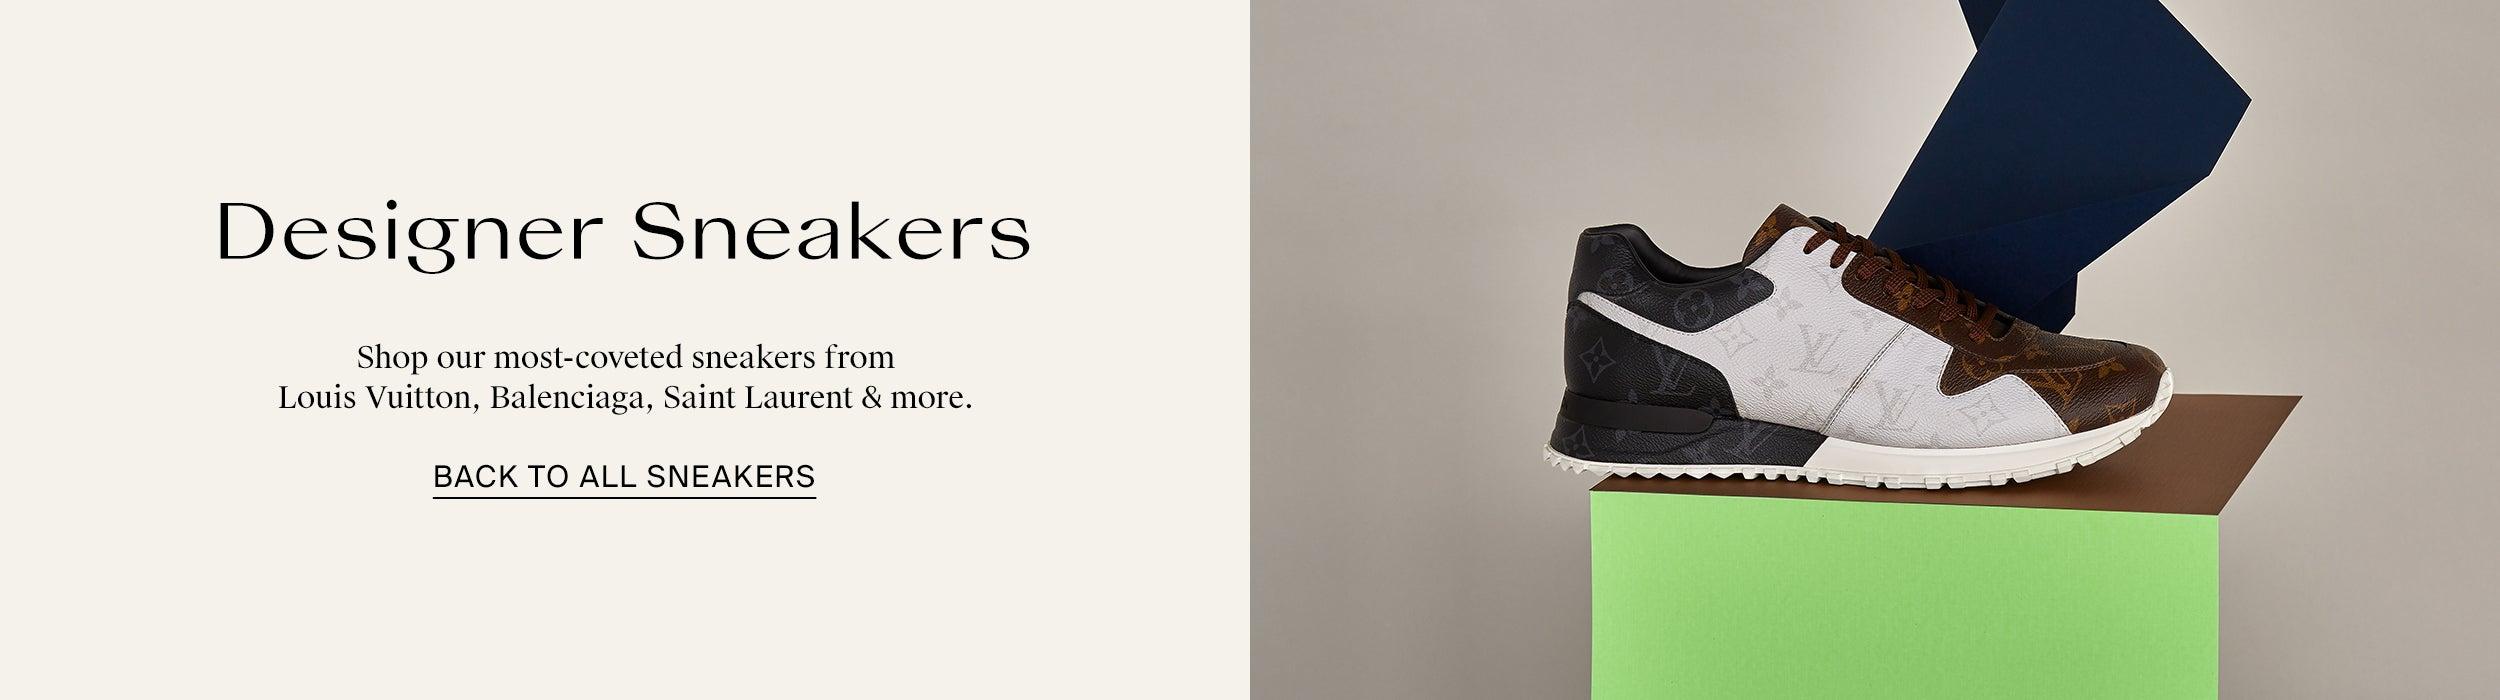 24eeb6708df3 Designer Sneakers